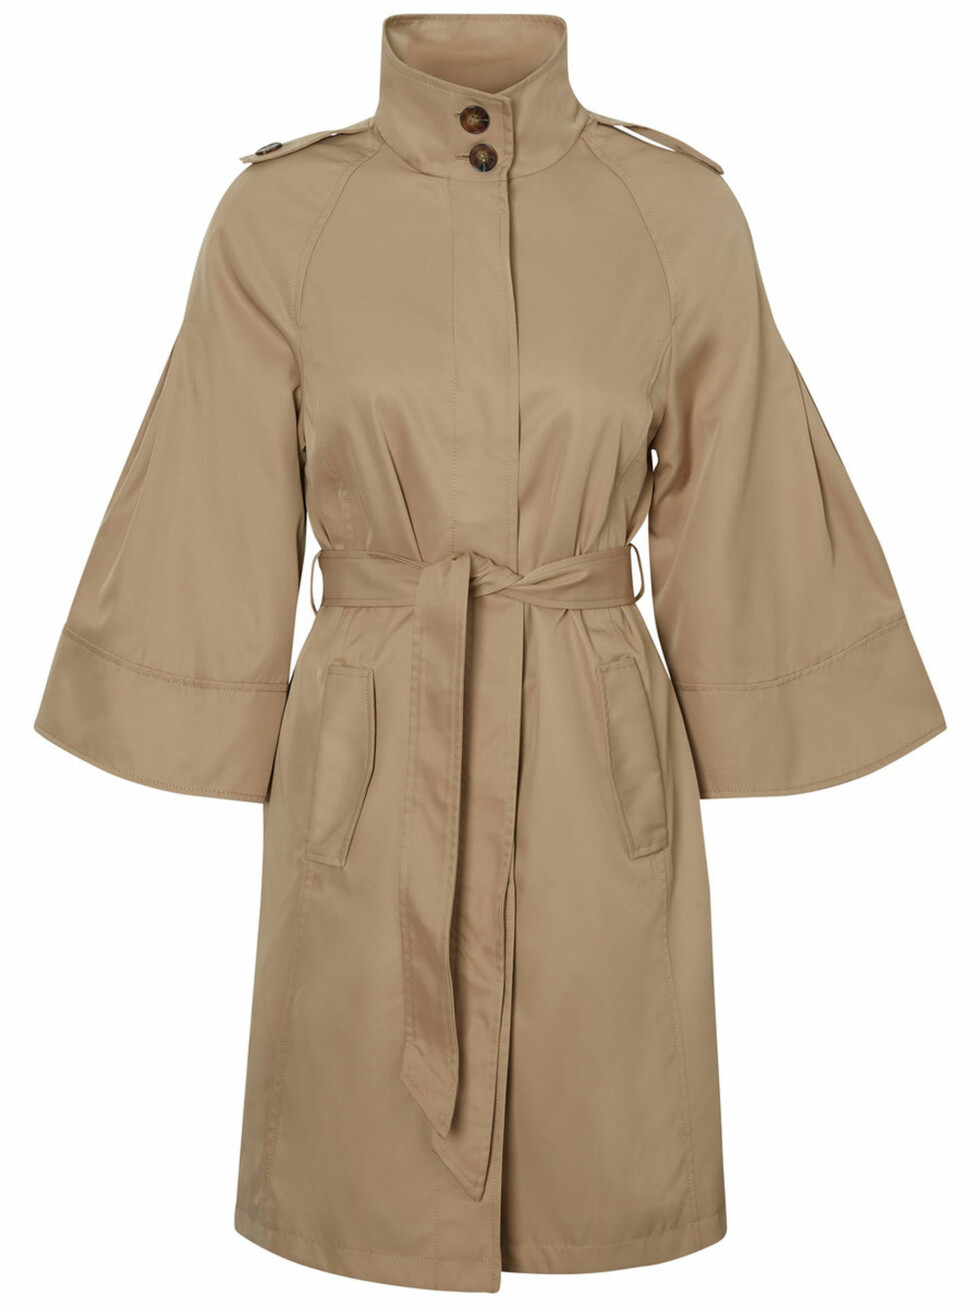 Trenchcoat fra Vero Moda |550,-| https://www.veromoda.com/no/no/vm/kjoep-etter-kategori/jakker/3-4-sleeved-trenchcoat-10189744.html?cgid=vm-jackets&dwvar_colorPattern=10189744_Travertine